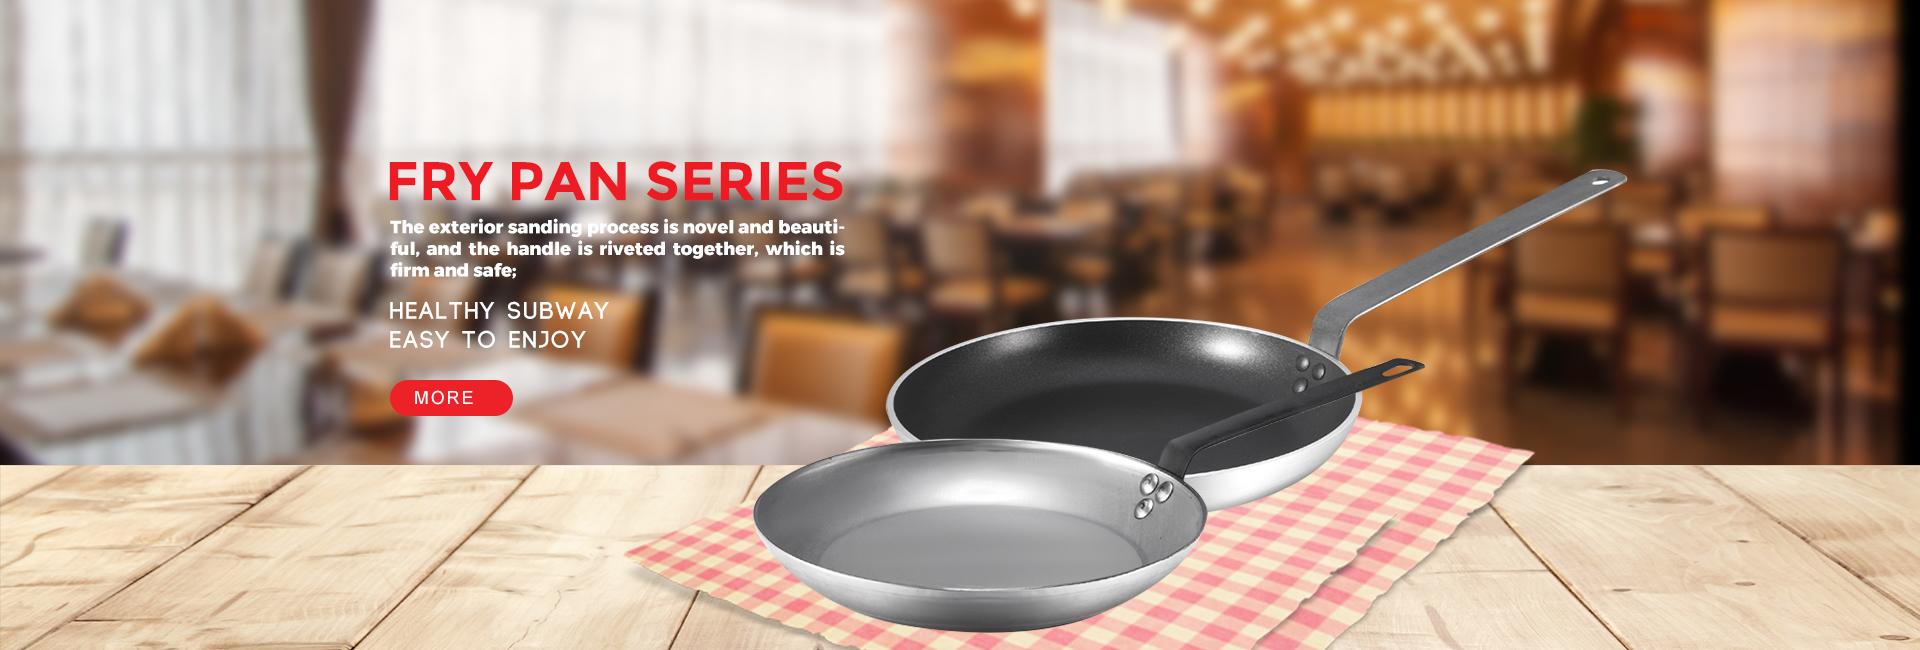 Fry Pan Series